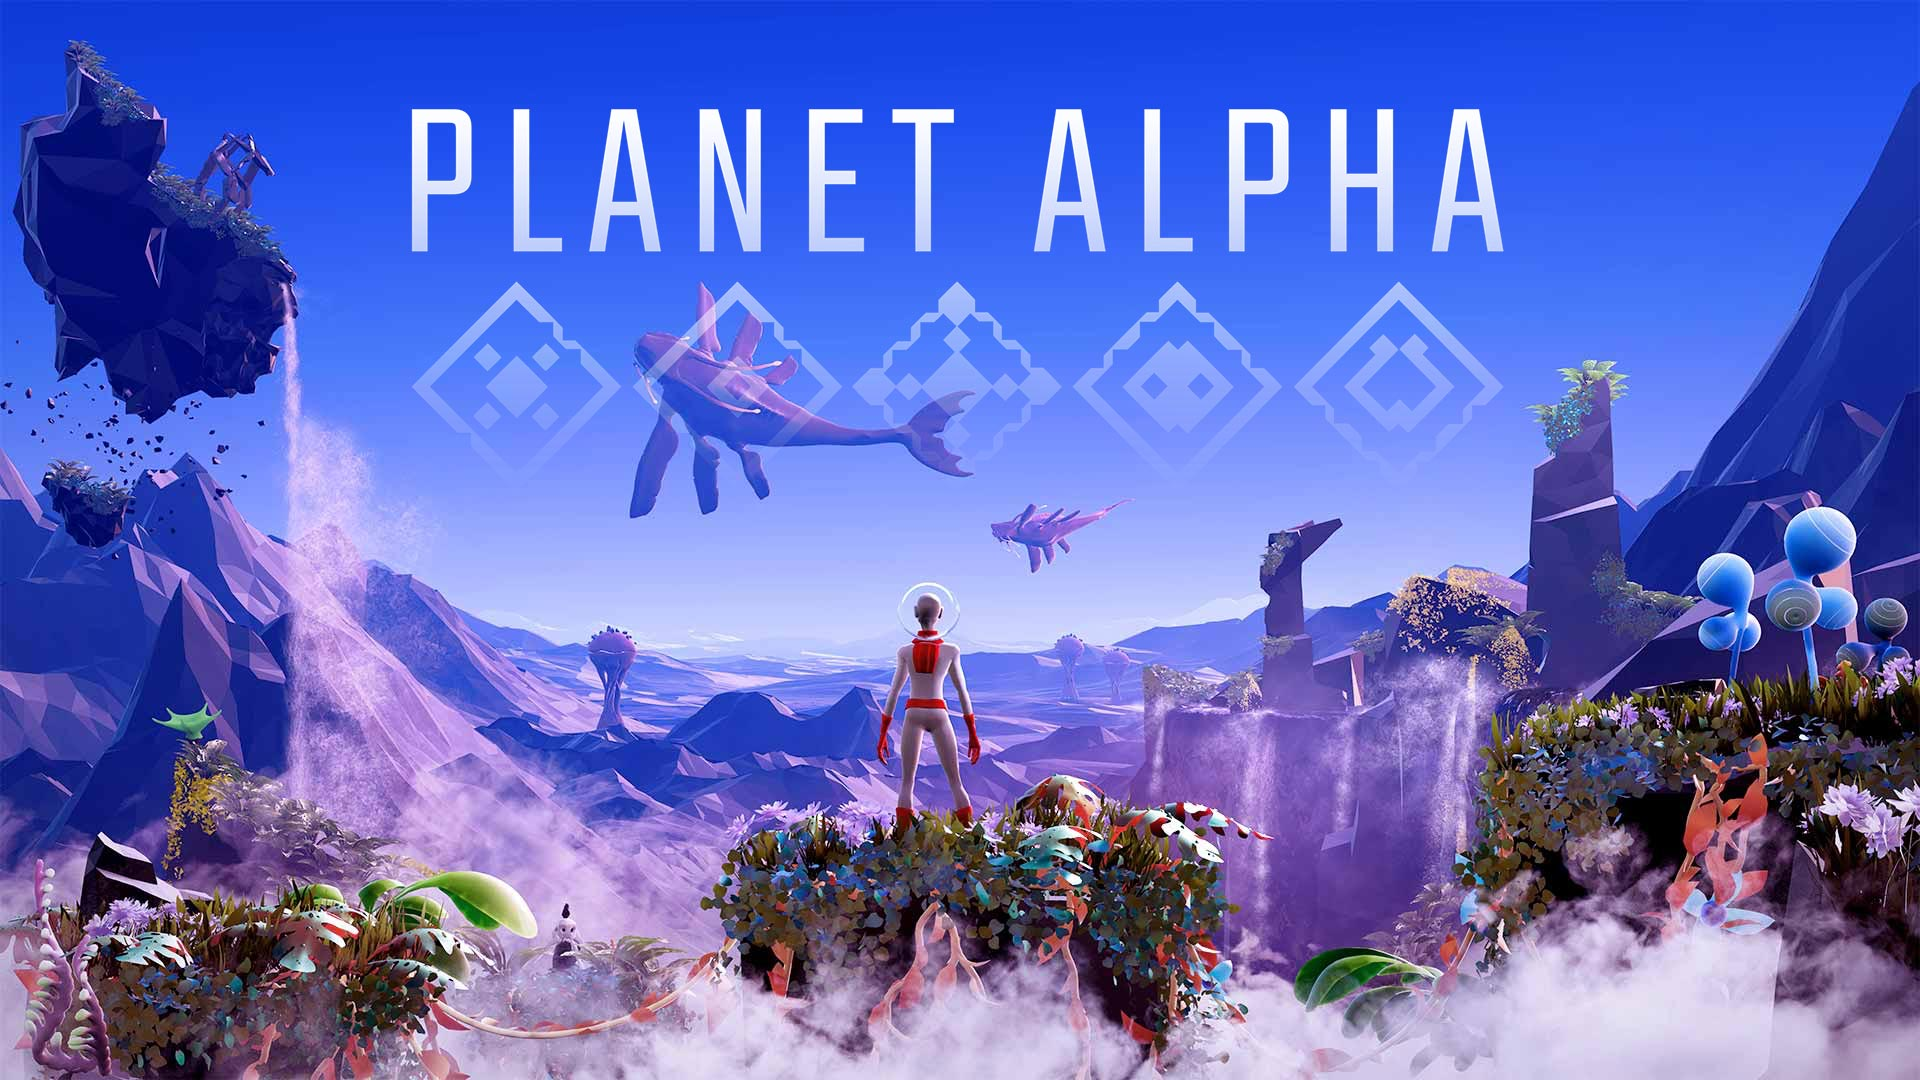 Introducing PLANET ALPHA